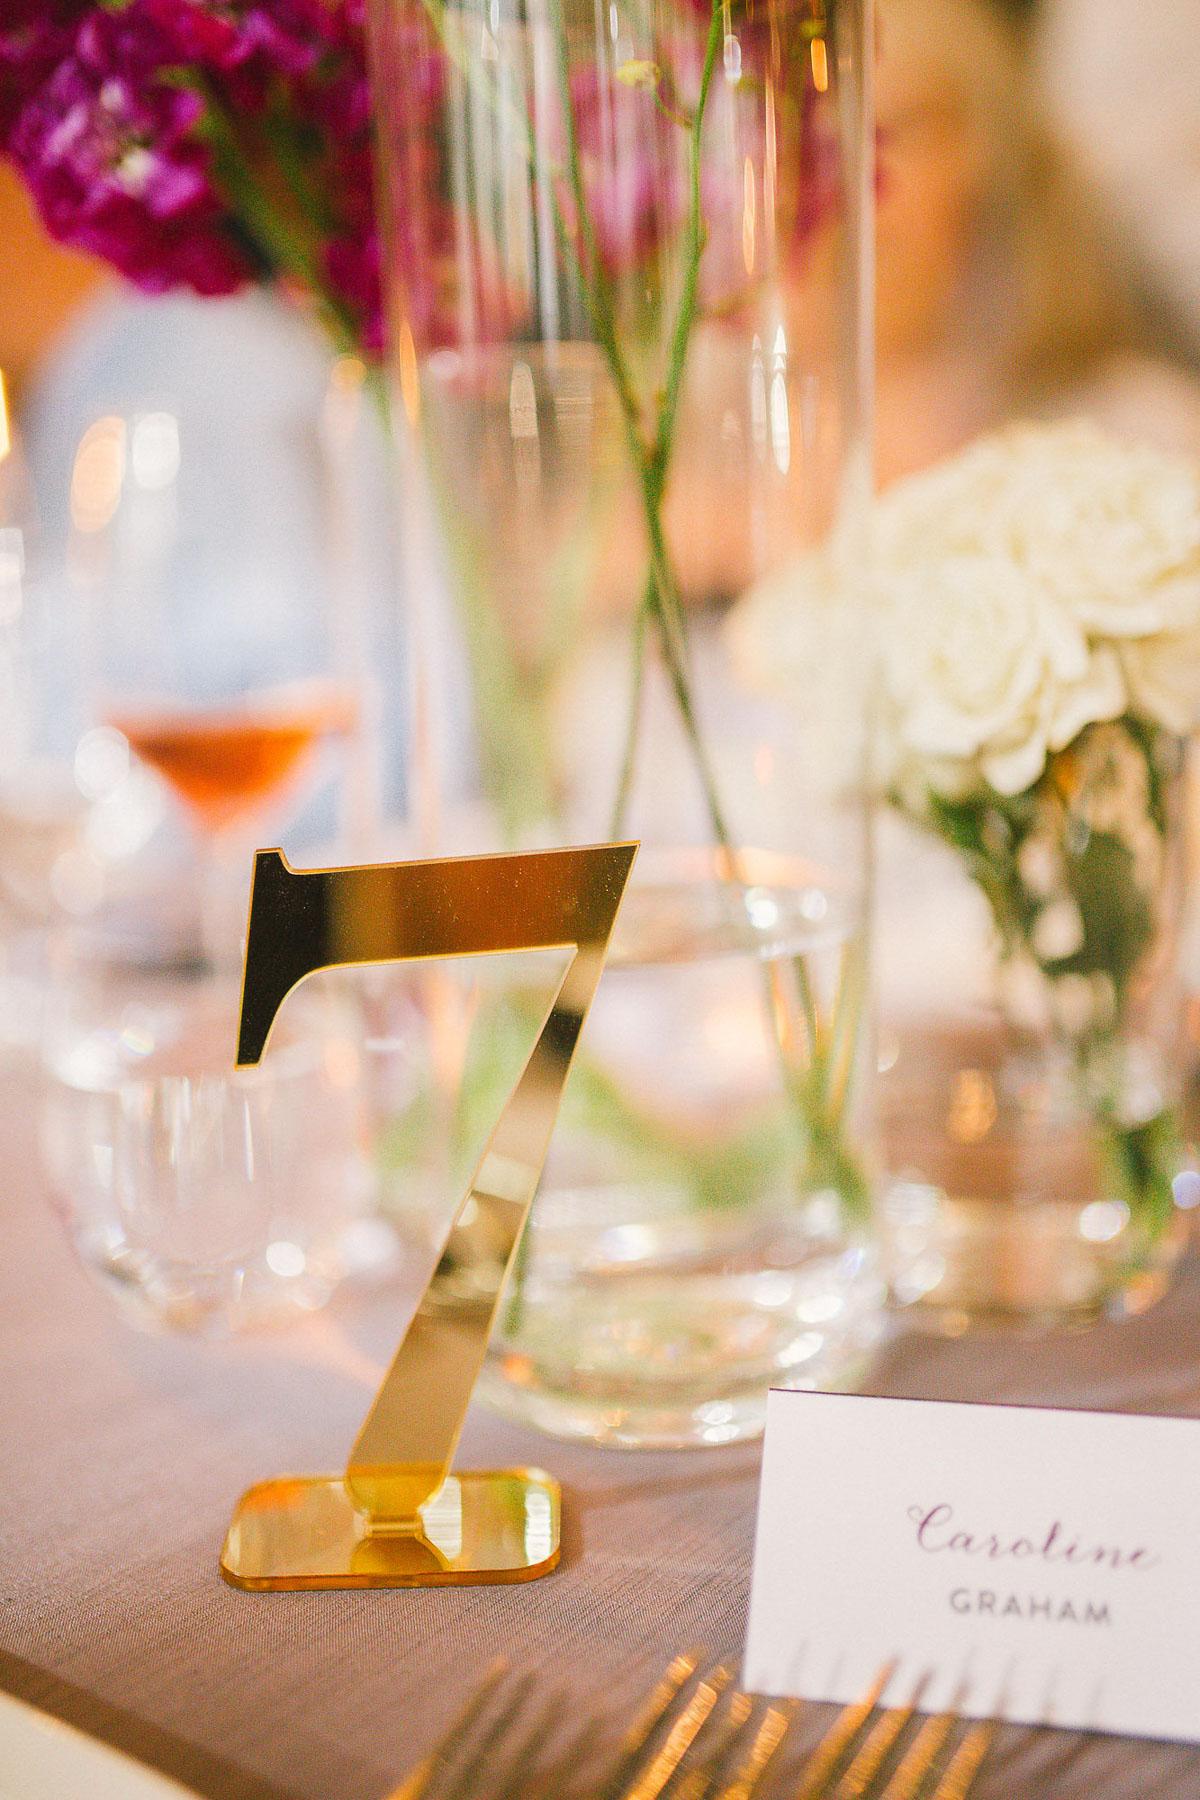 julia-park-photography-vineyard-bride-swish-list-stratus-winery-niagara-on-the-lake-wedding-29.jpg